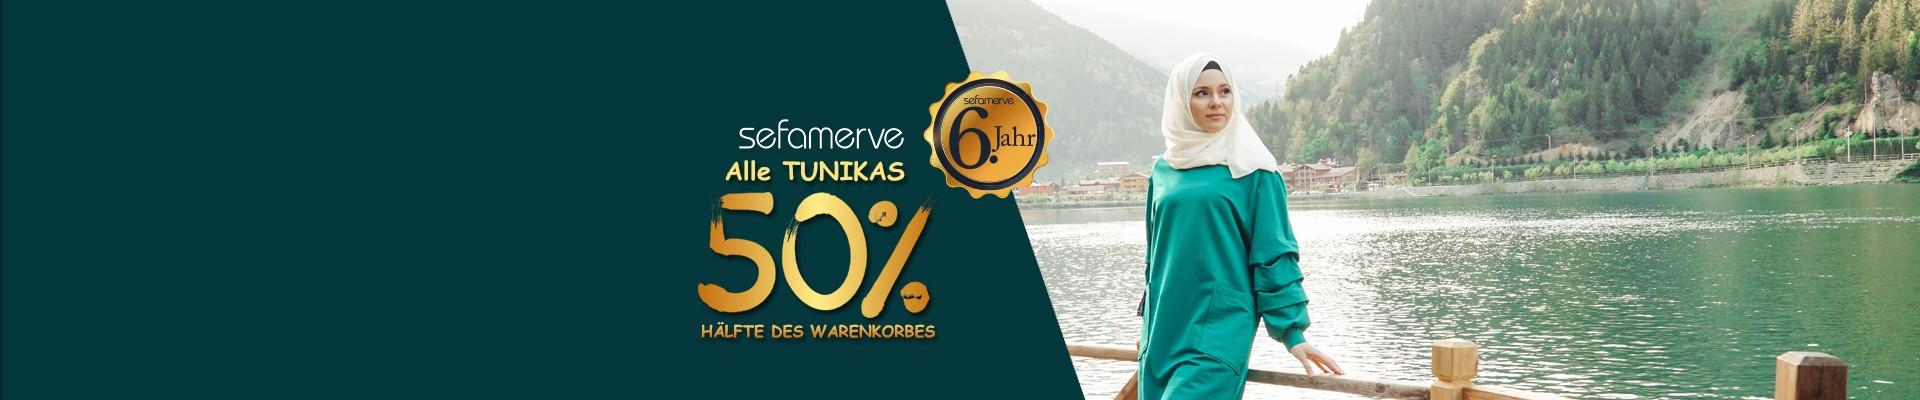 Alle Sefamerve Tunikas 50% im Warenkorb